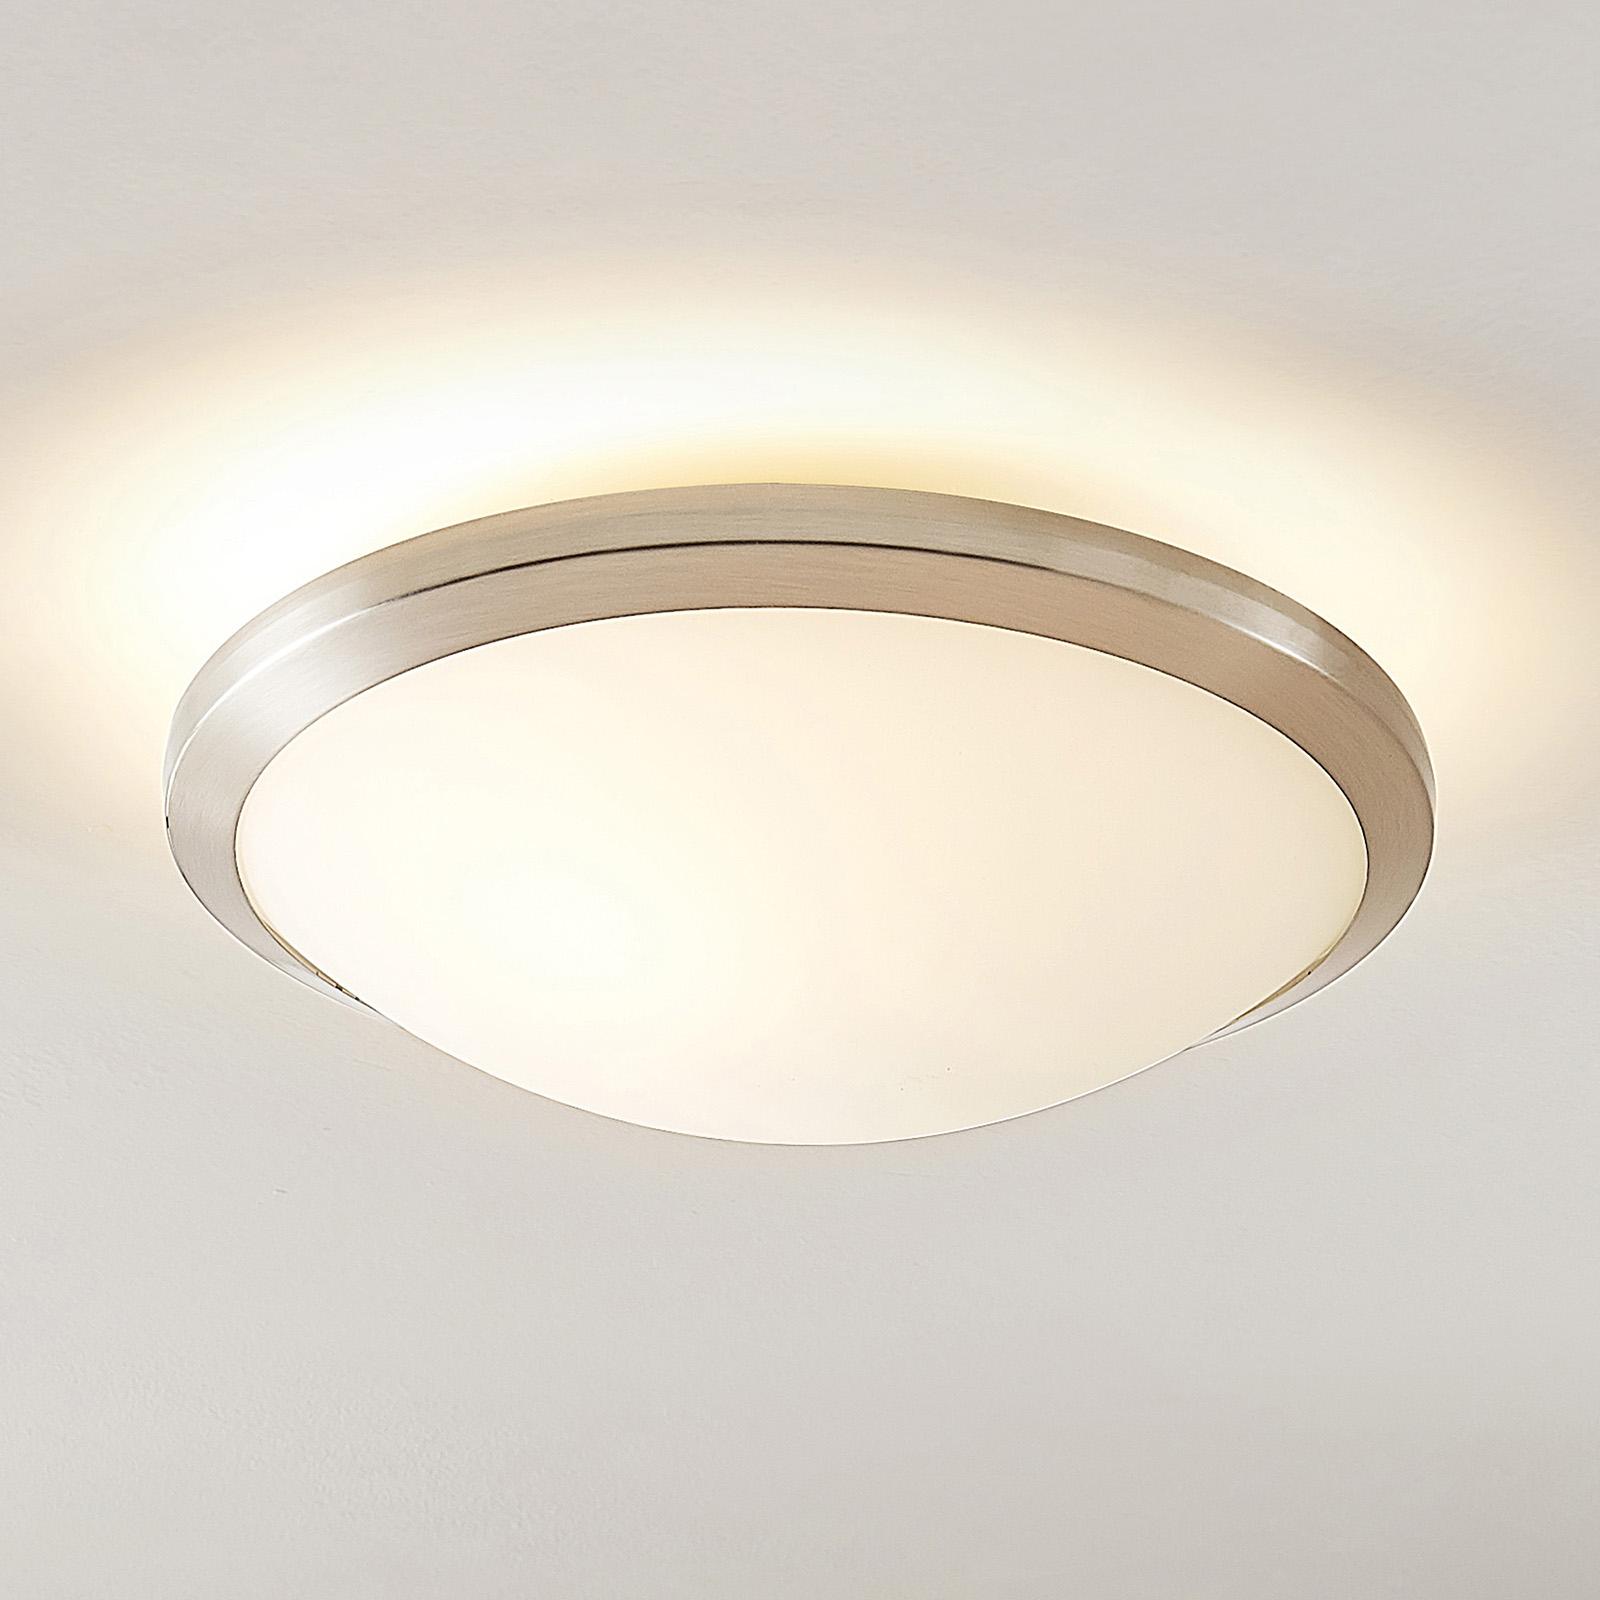 Lindby Ummi plafondlamp, nikkel satijn